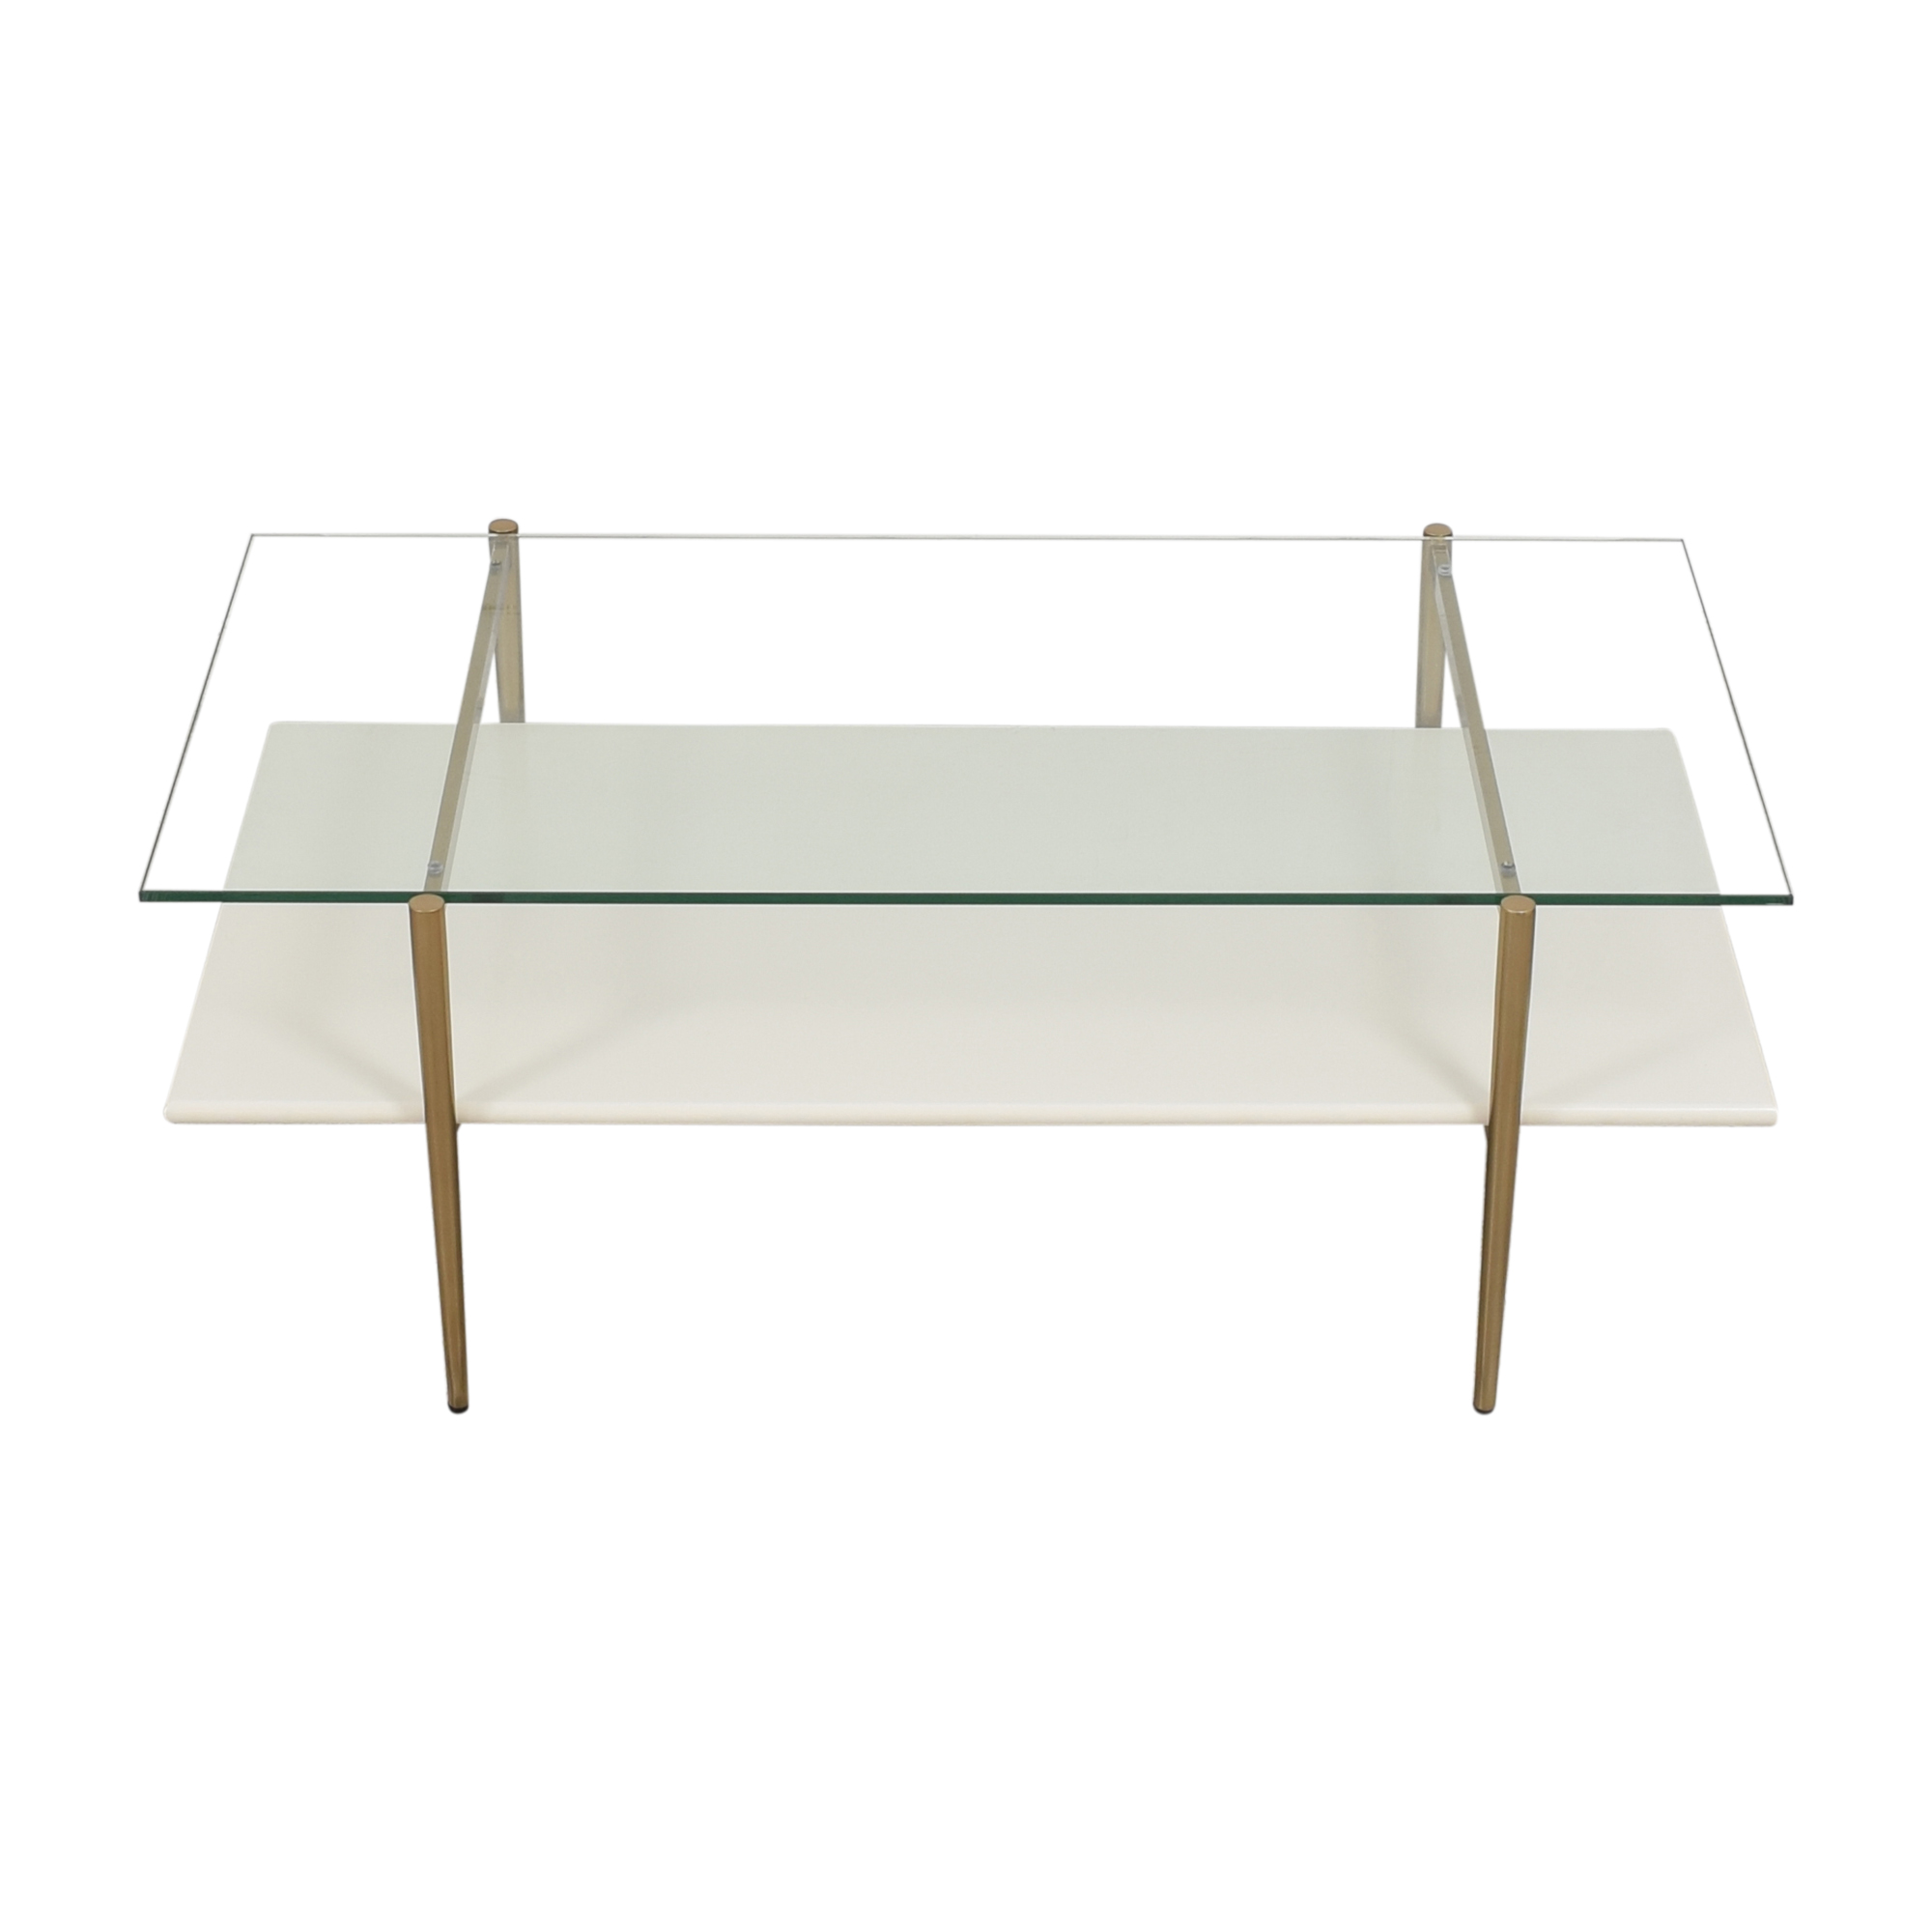 West Elm Mid Century Art Display Coffee Table / Tables